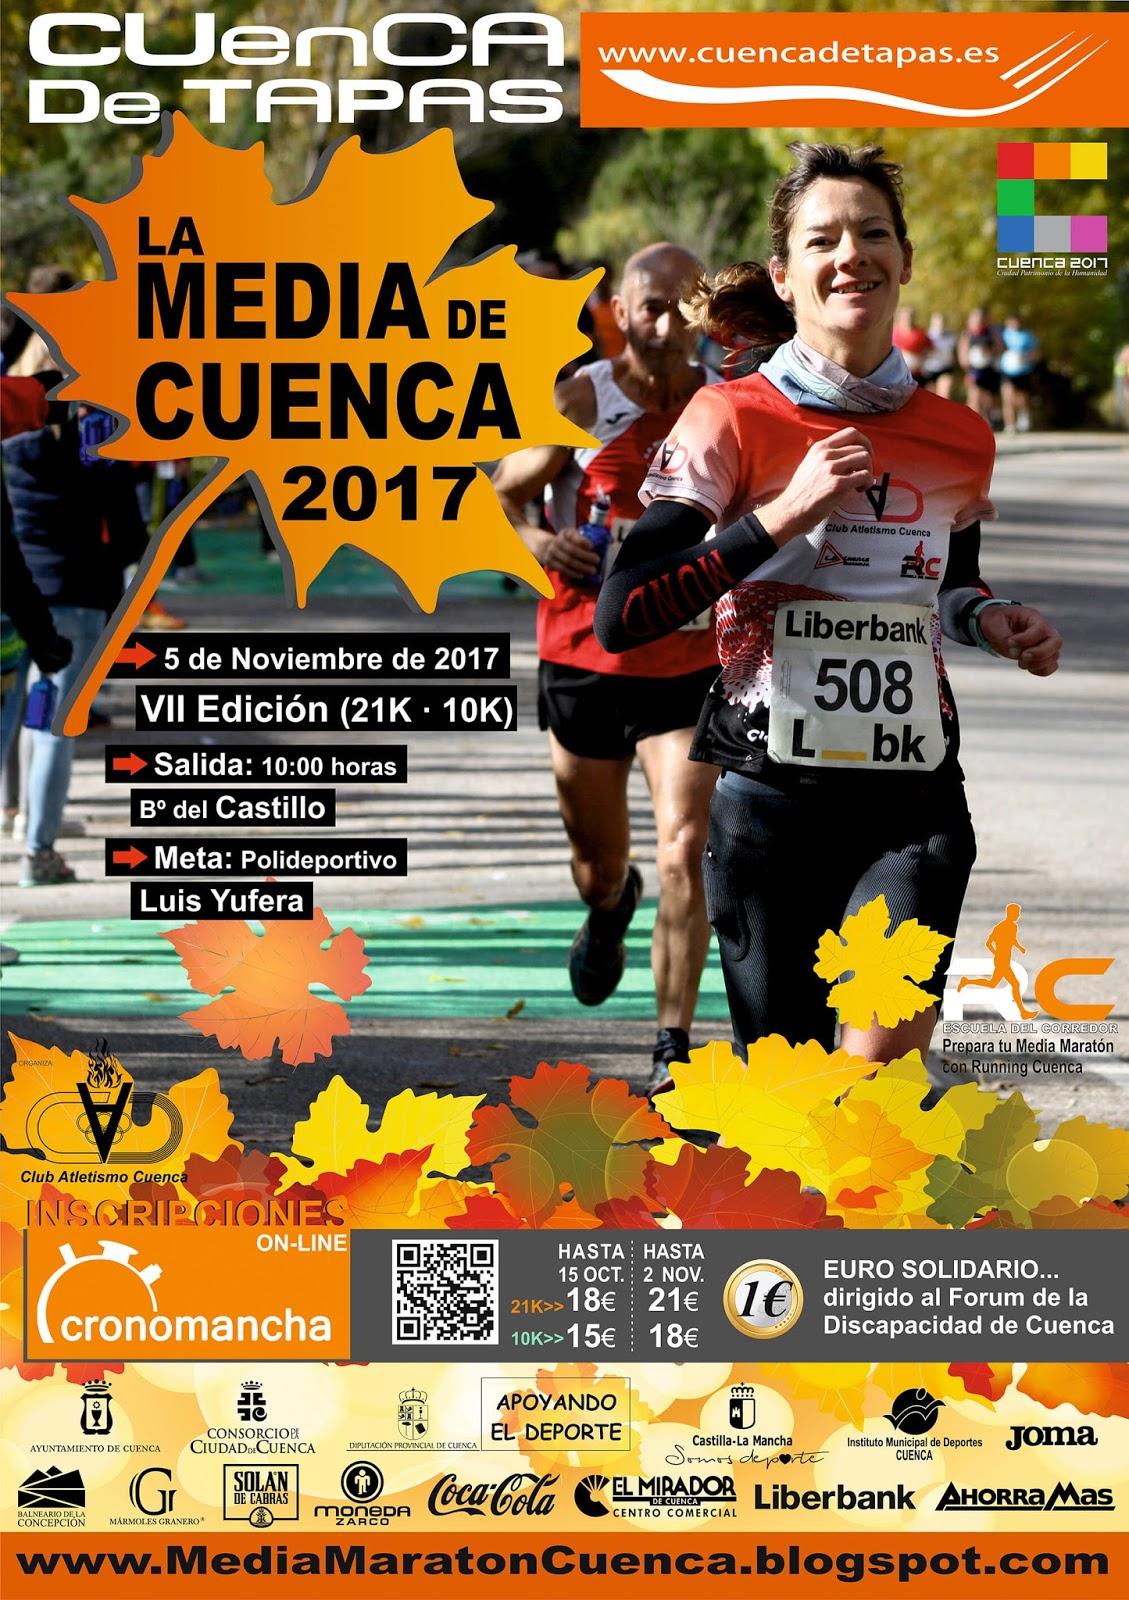 https://1.bp.blogspot.com/-ov3YXR1rq8A/WbHBj1nE46I/AAAAAAAAUoU/Et_7HyVXSPUKFILWeaJqwa9grWmPdaCLACLcBGAs/s1600/Cartel_Media_Maraton%2B2017_WEB%25281%2529.jpg